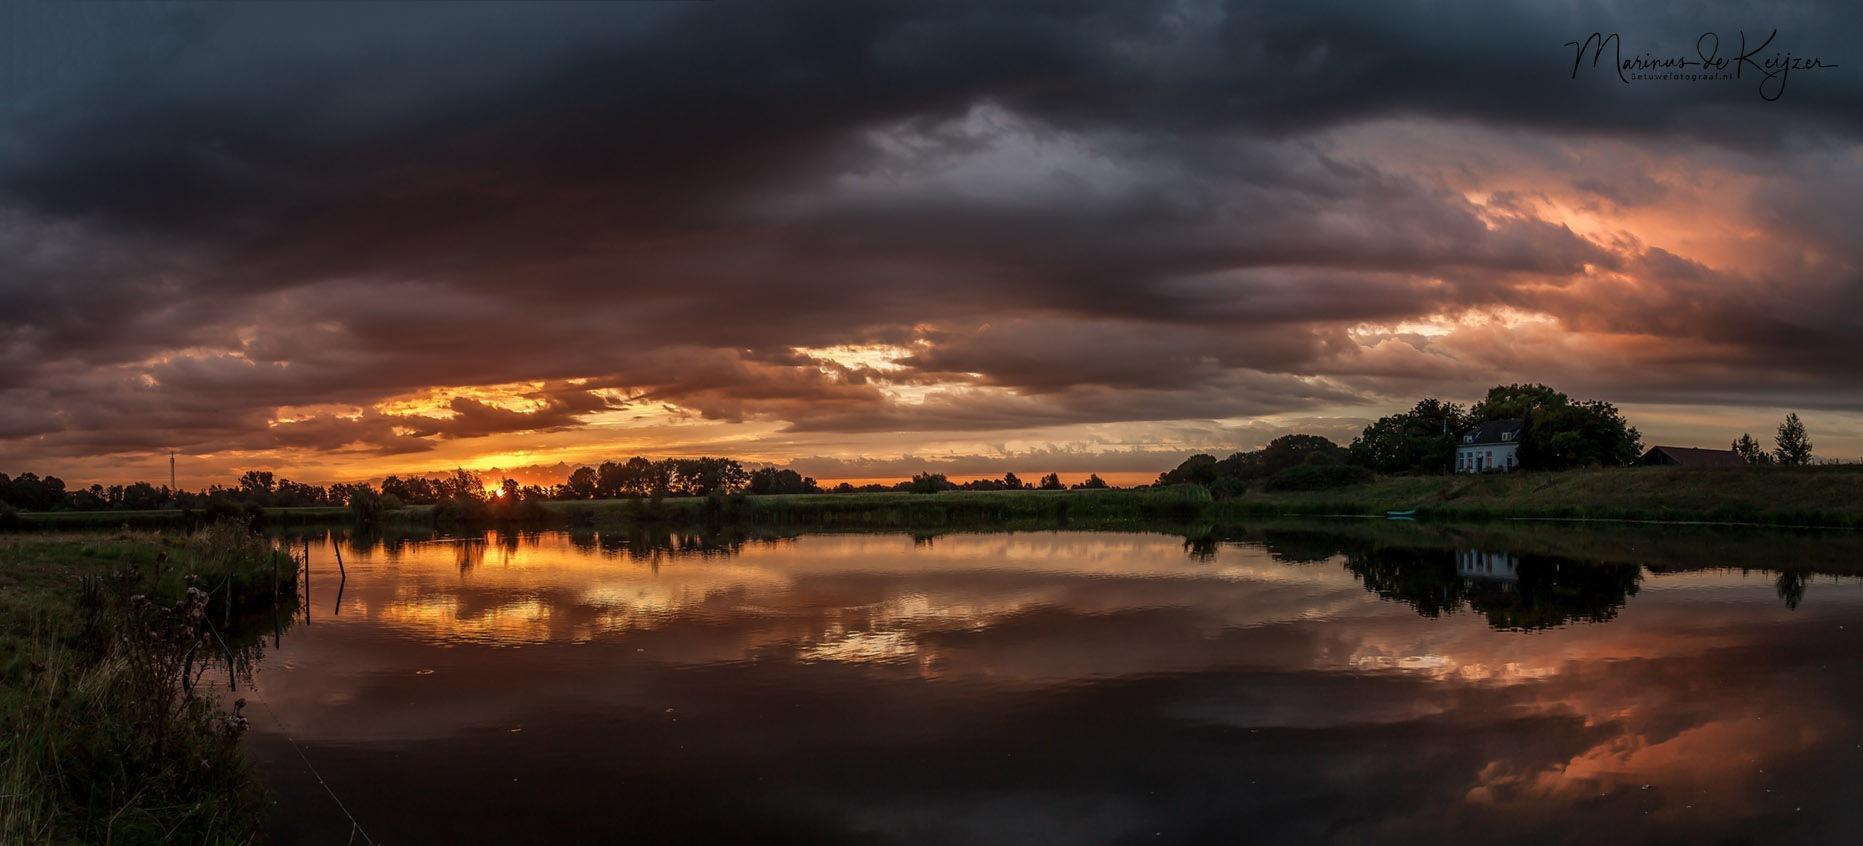 Goodmorning Sunrise in de Betuwe by Betuwefotograaf